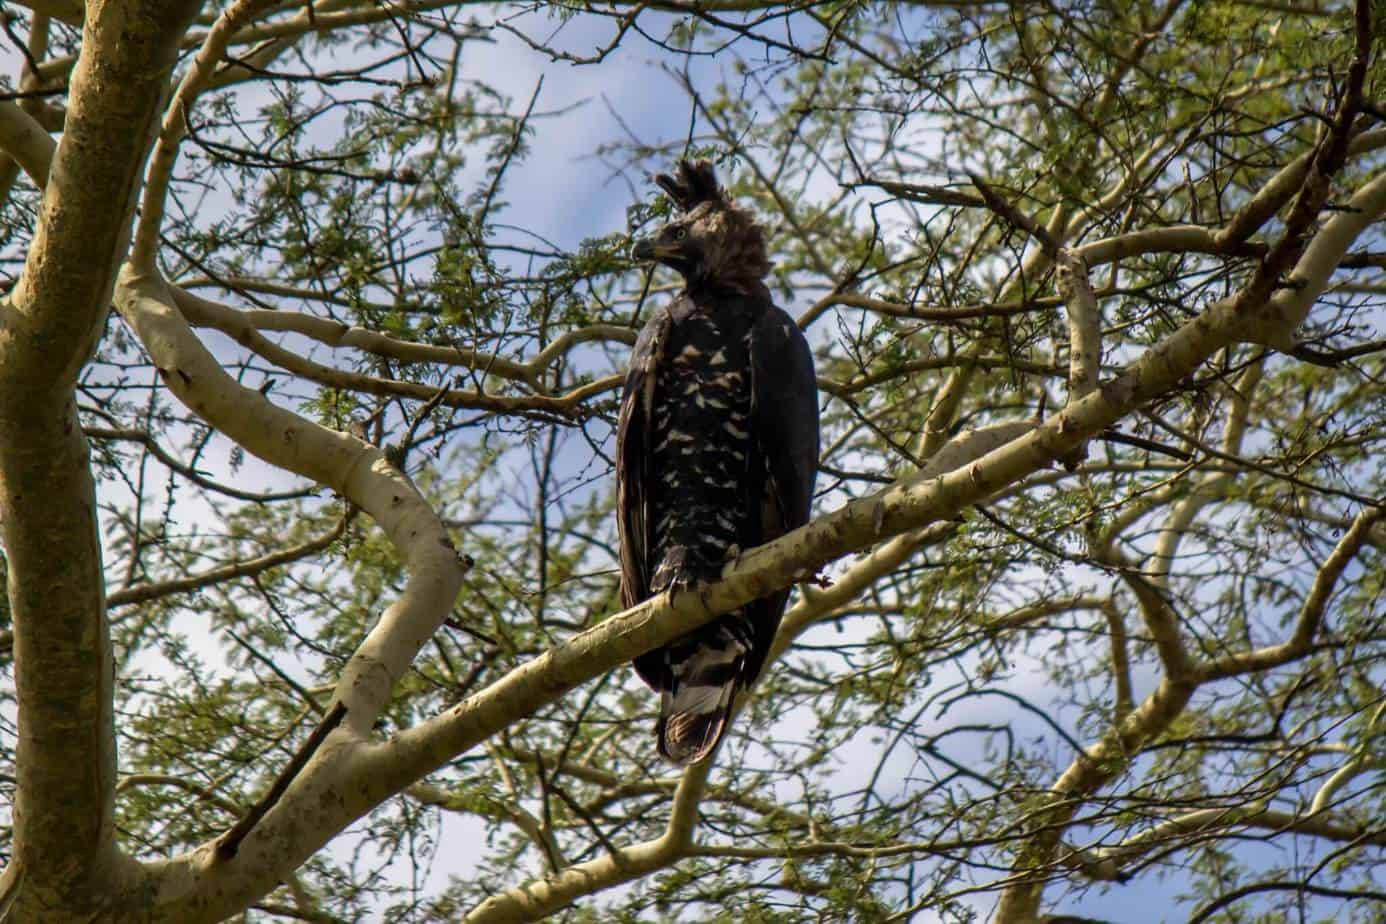 IMG 8022 4 - Ndumo Game Reserve